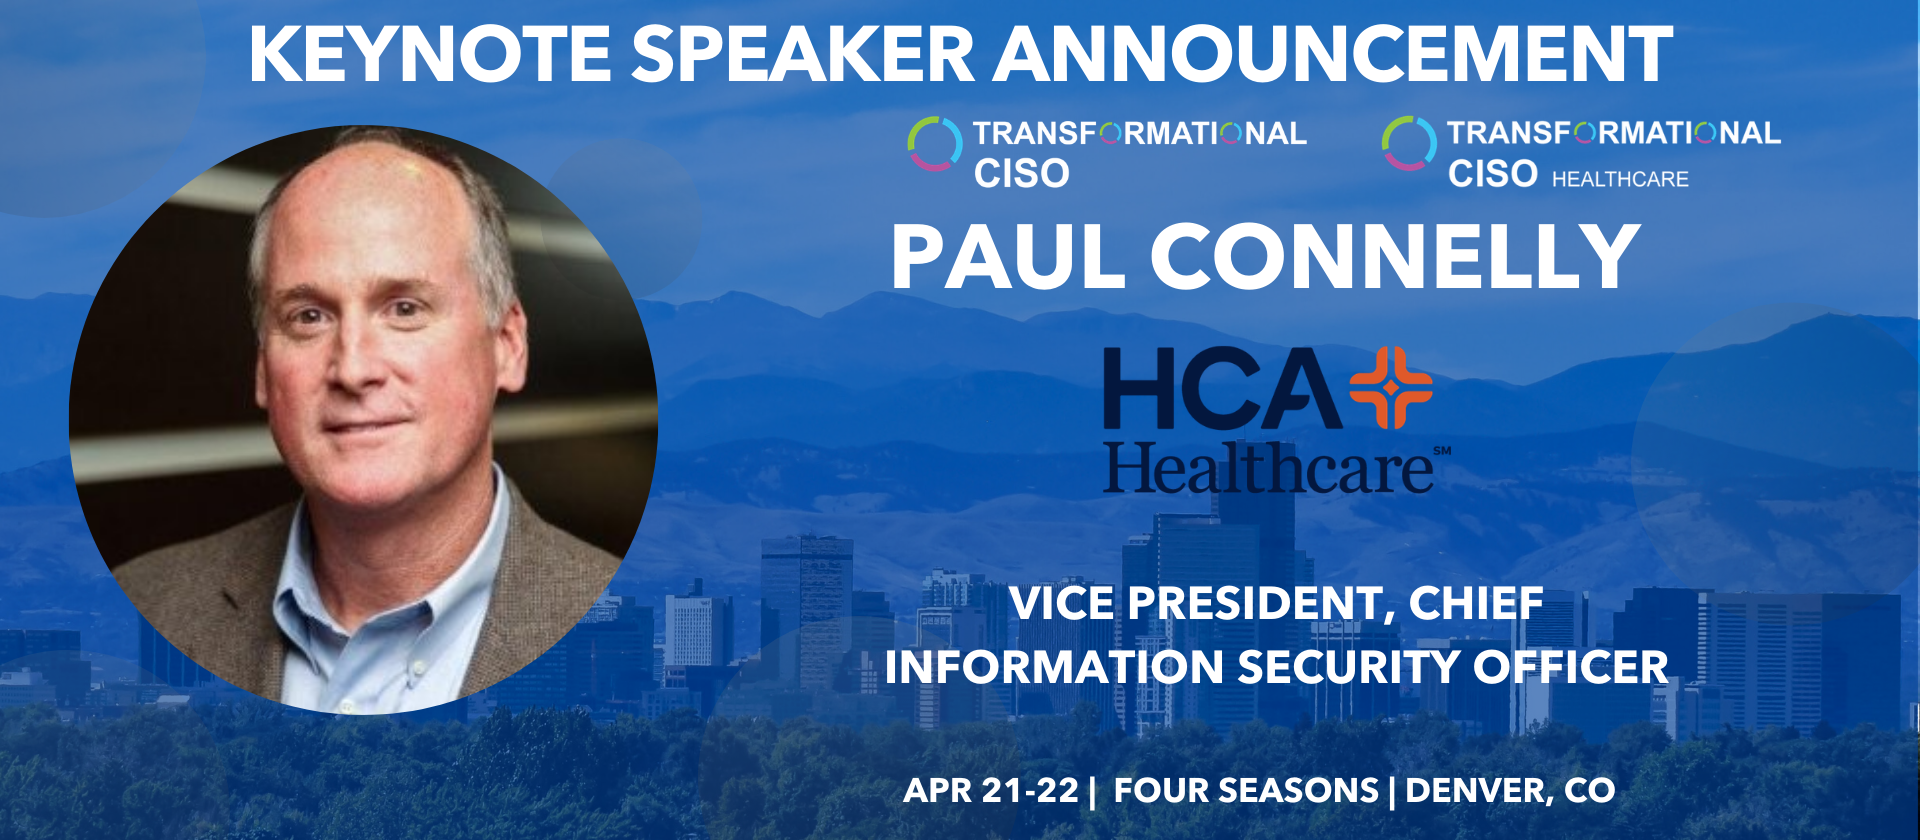 Keynote Speaker Paul Connelly HCA Healthcare CISO